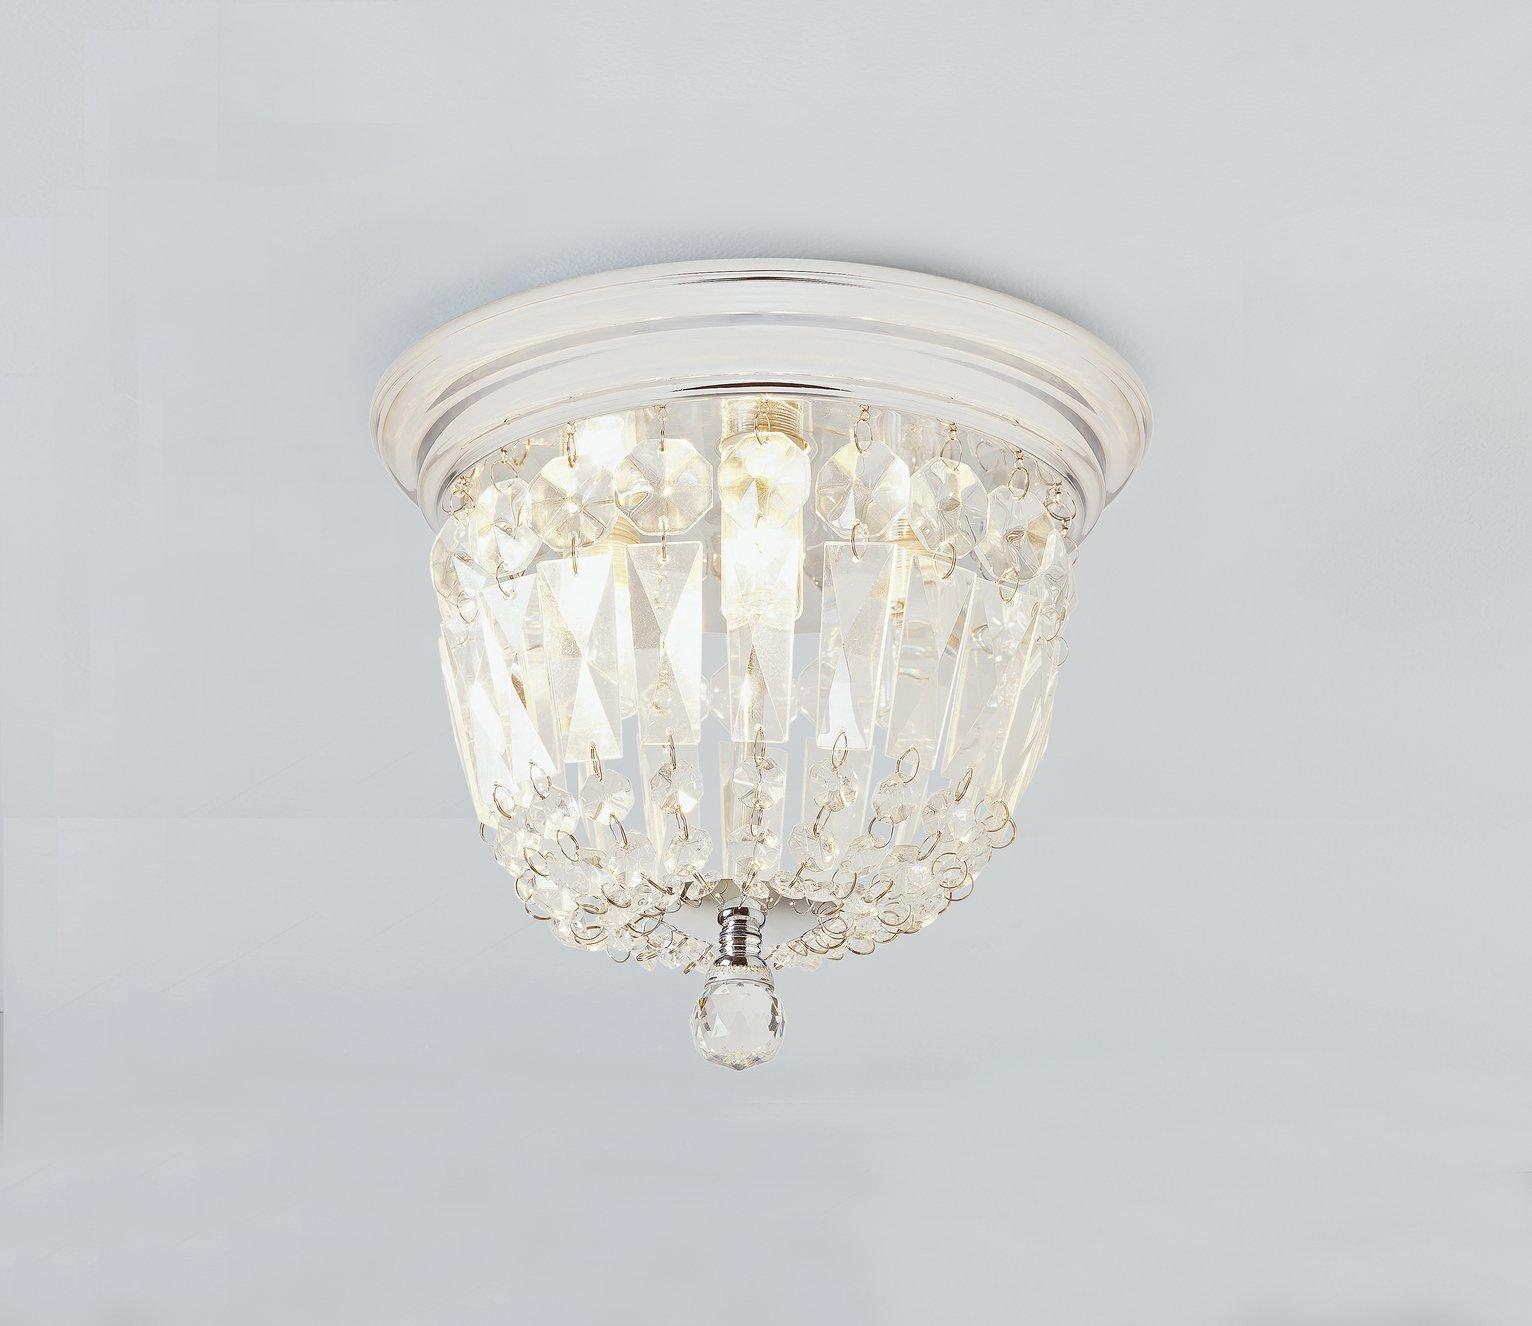 Bathroom Light Fixtures Argos buy collection ariana glass droplets bathroom light - chrome eff